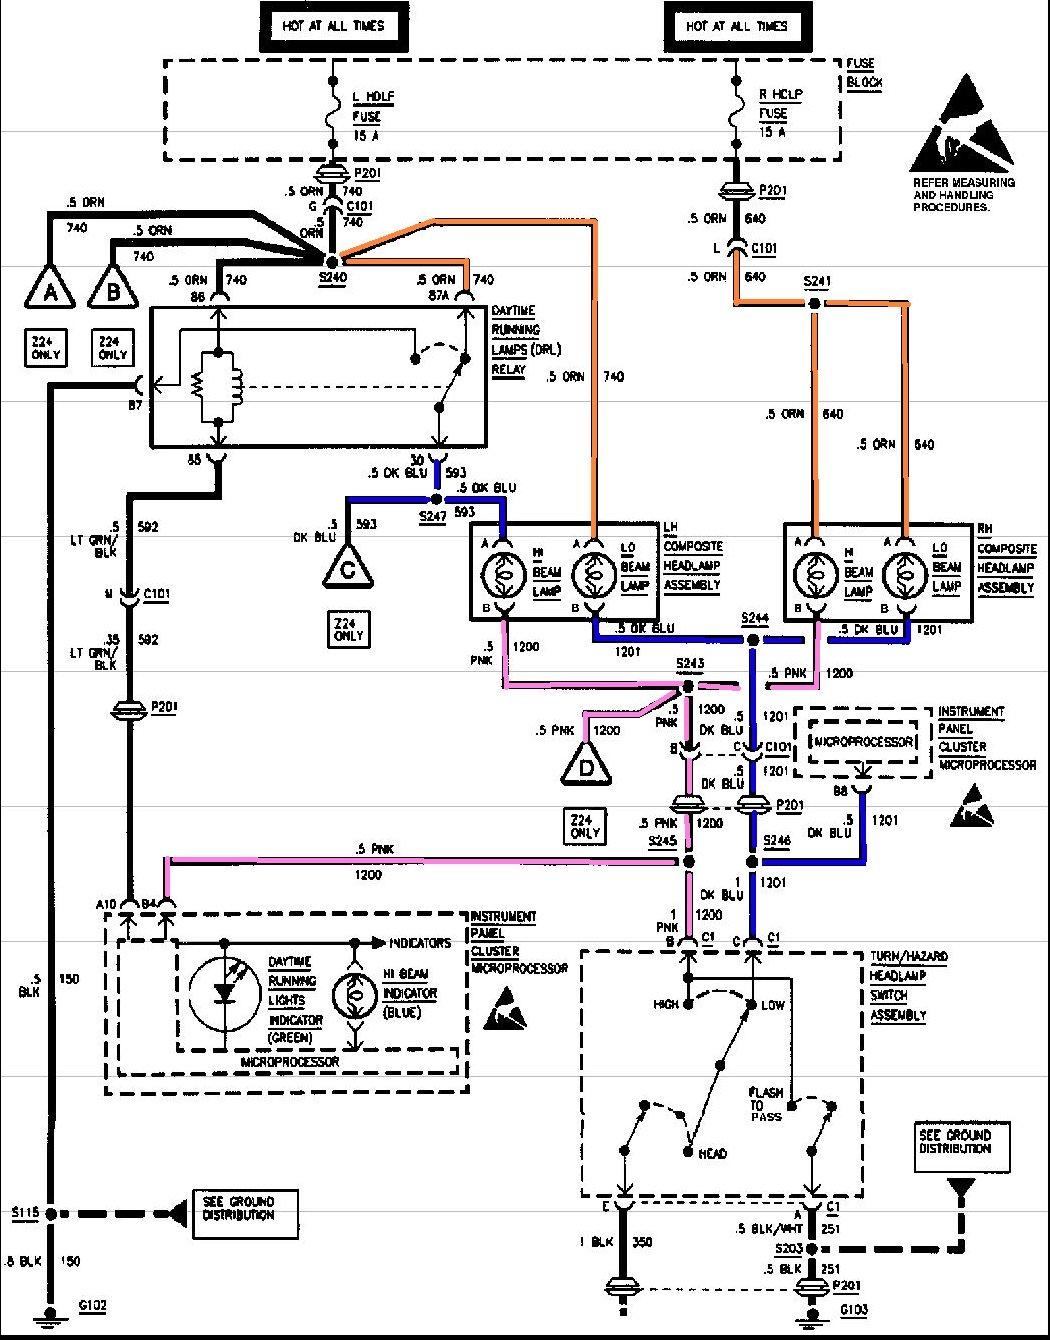 Chevy Cavalier Headlight Wiring Diagram